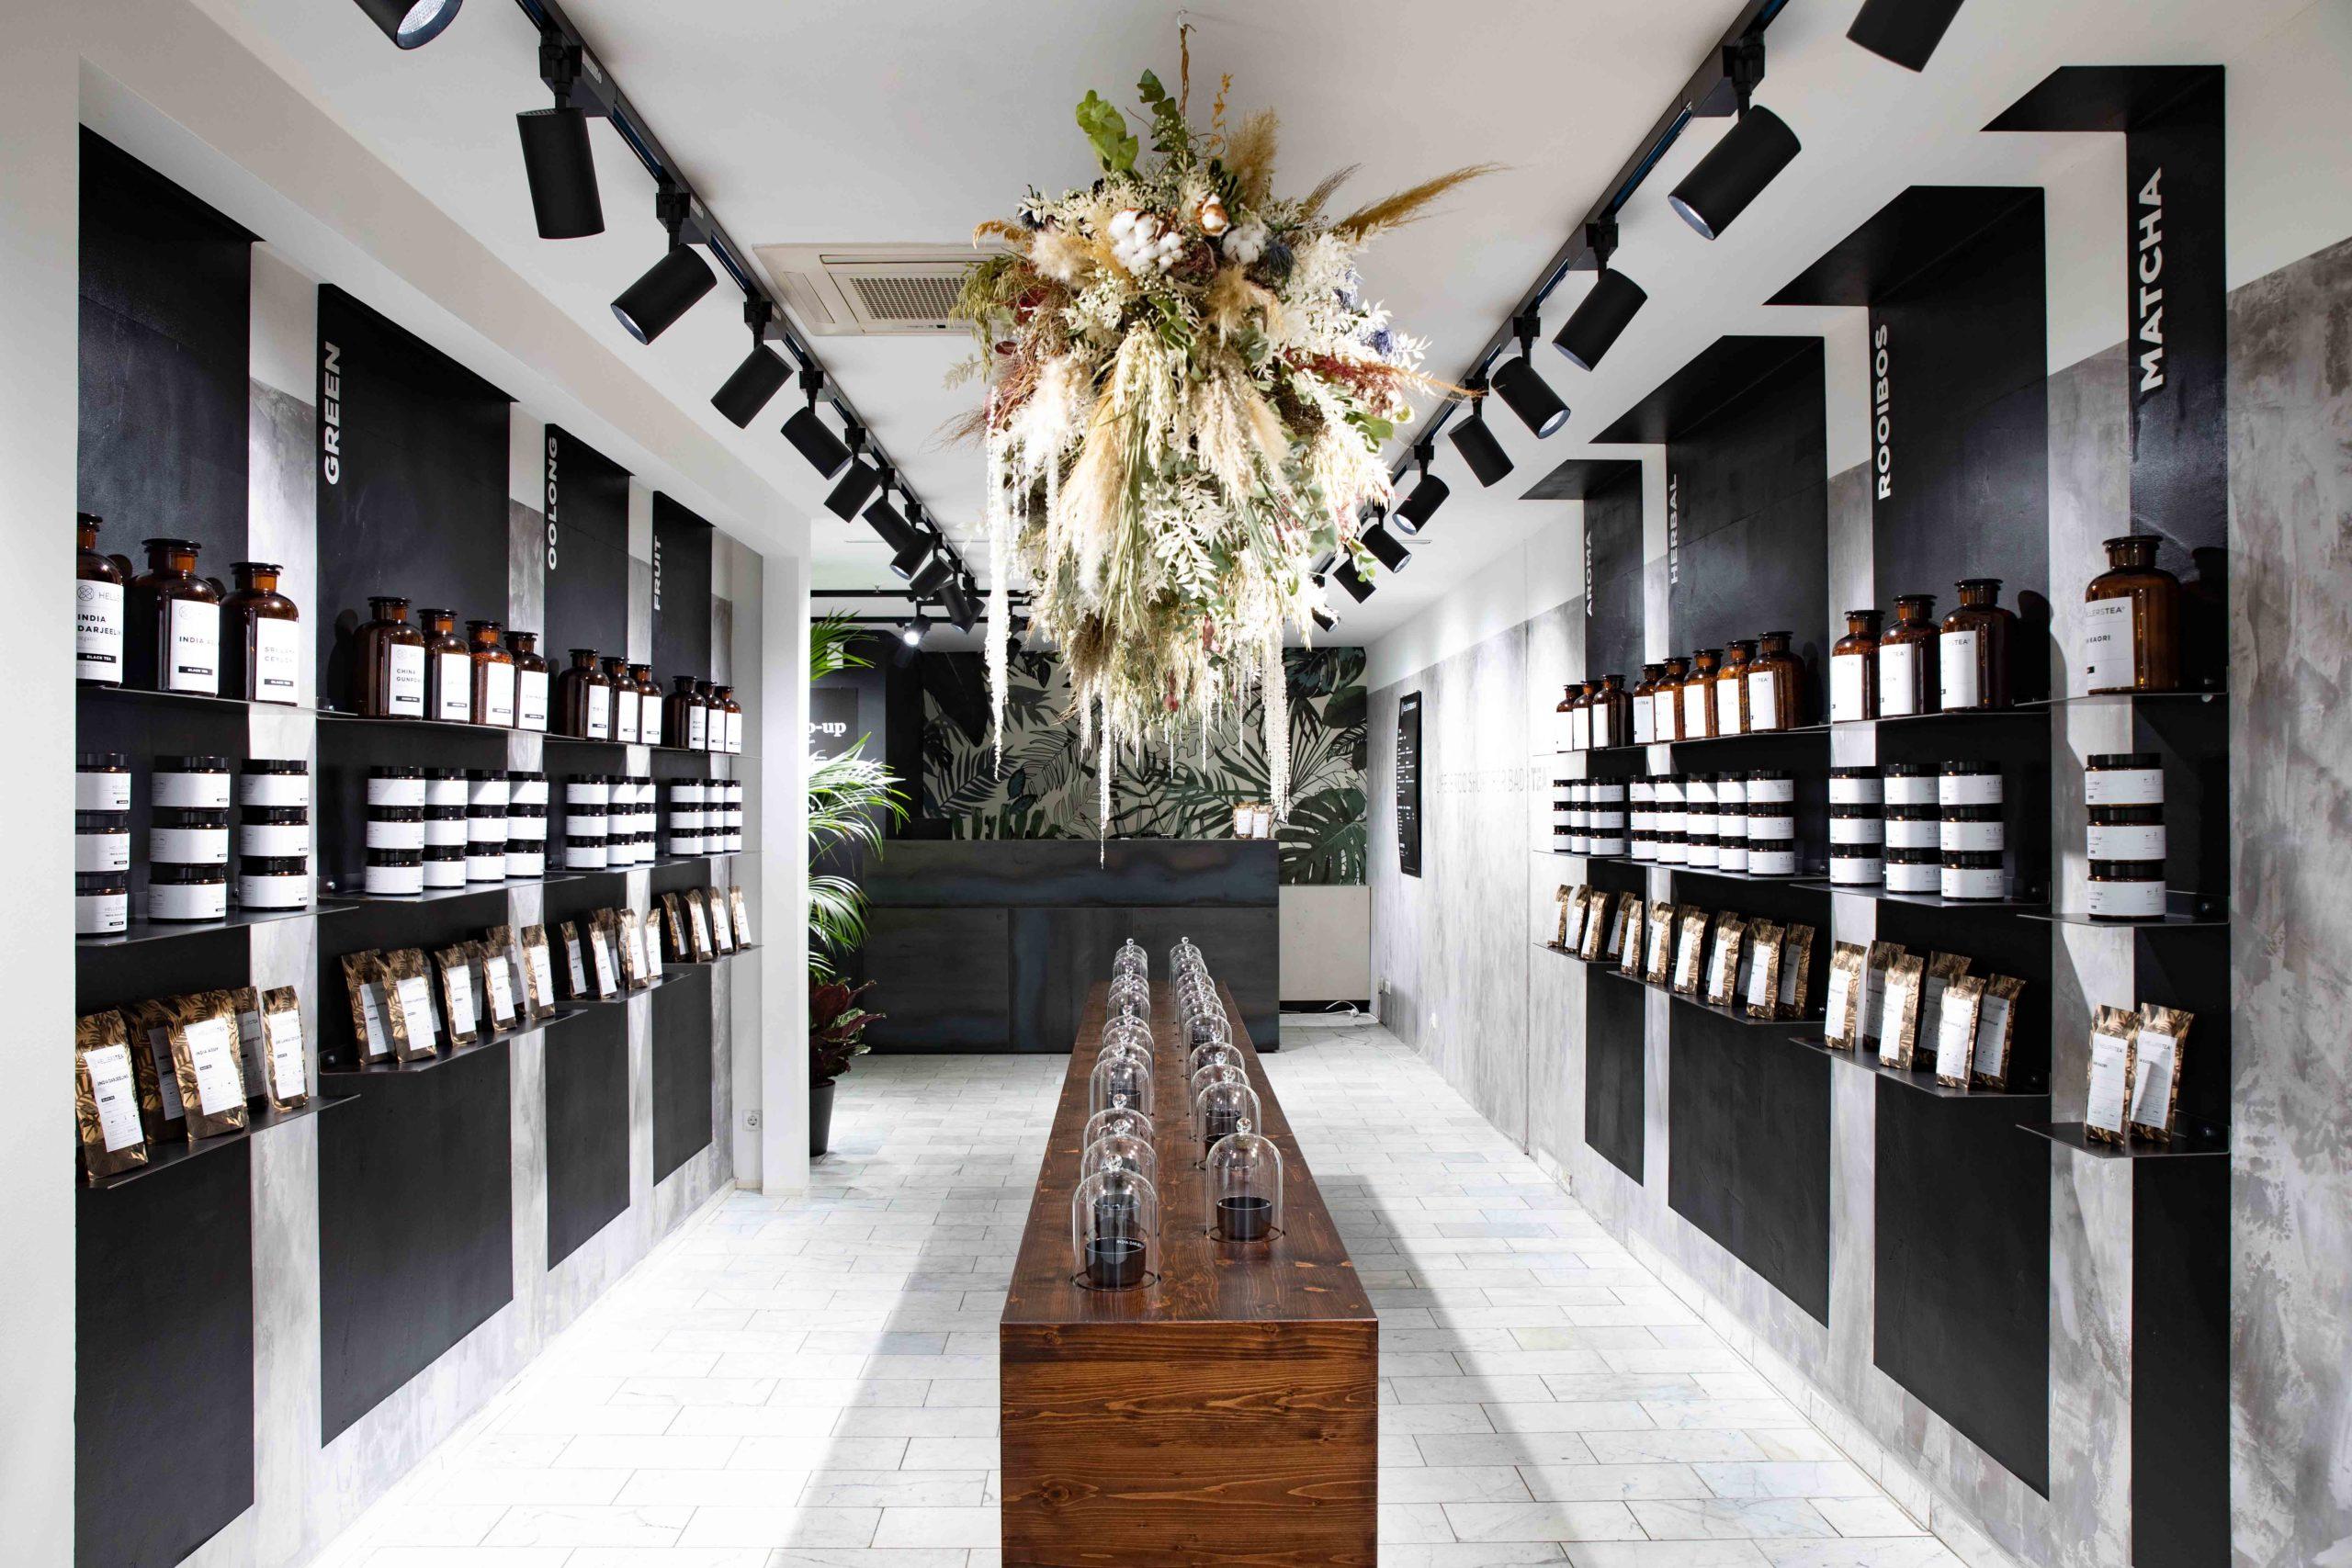 Raumgestaltung Hellers Tea Shop Nobla Innenarchitekt Karlsruhe